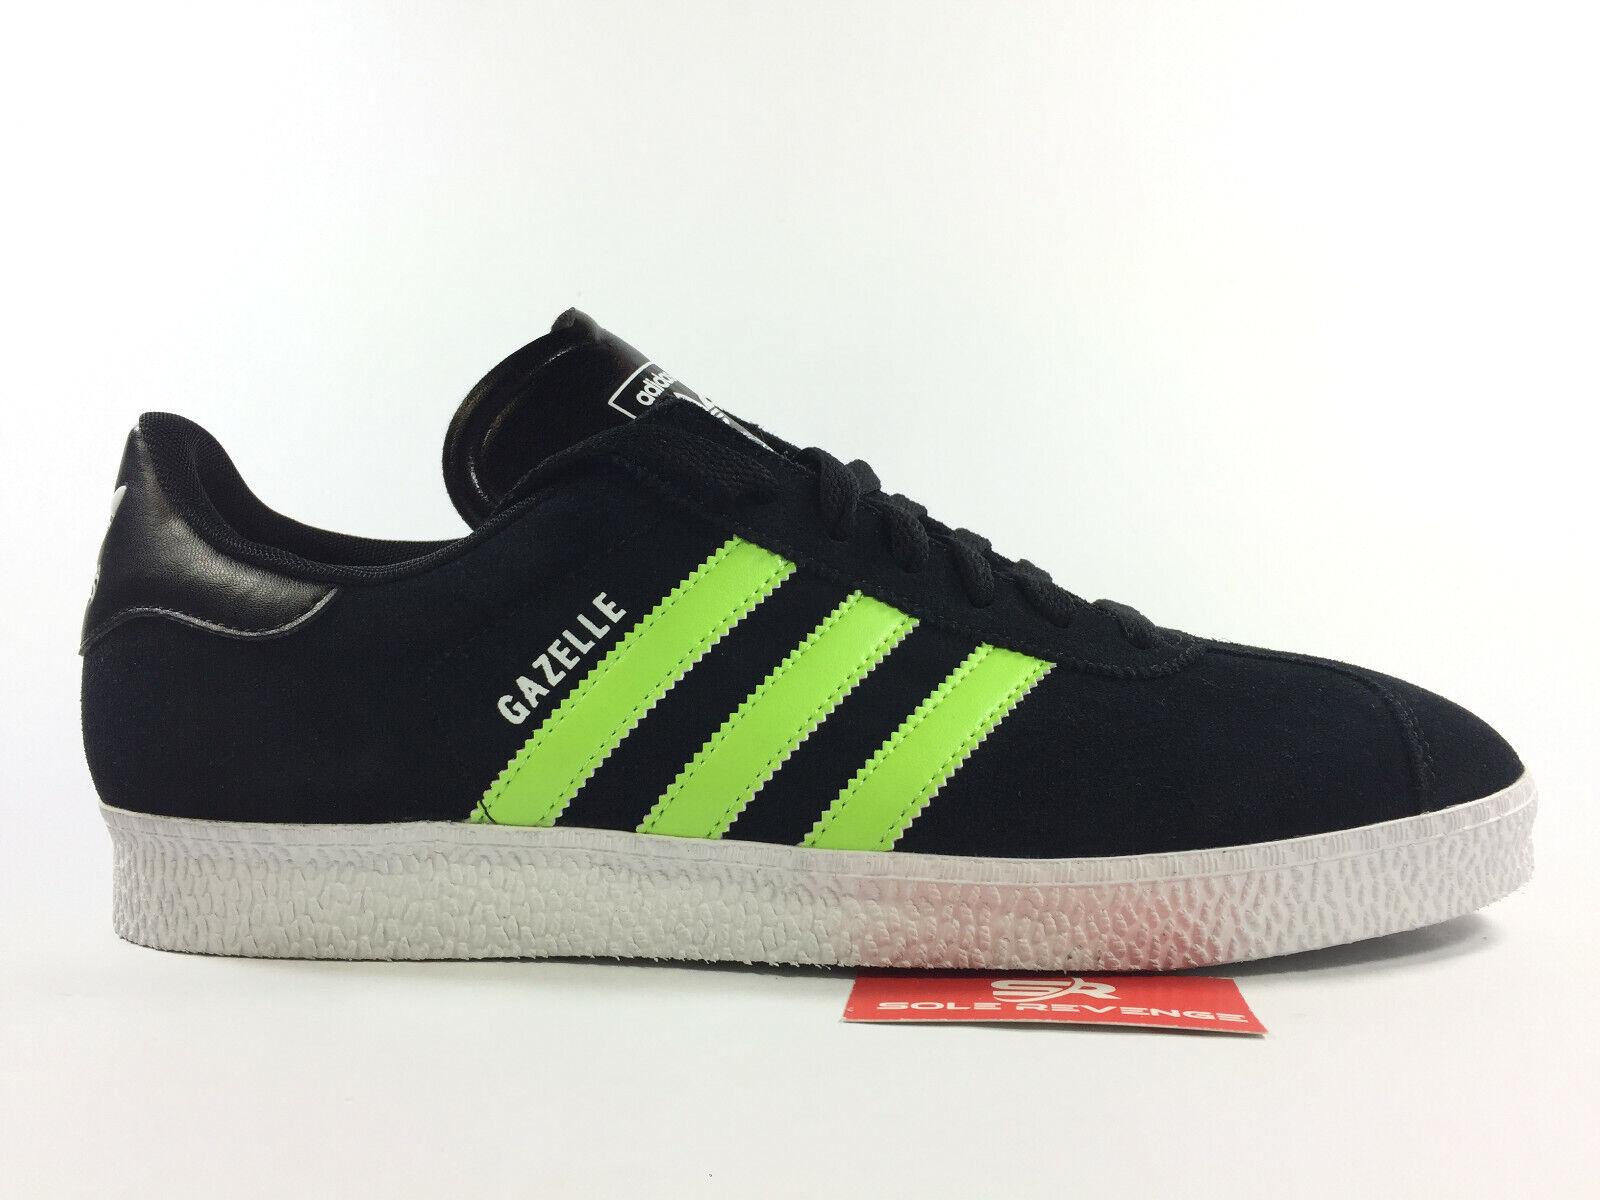 New Men adidas GAZELLE Black Slime Green Black G56656 v1 Trainers Shoes